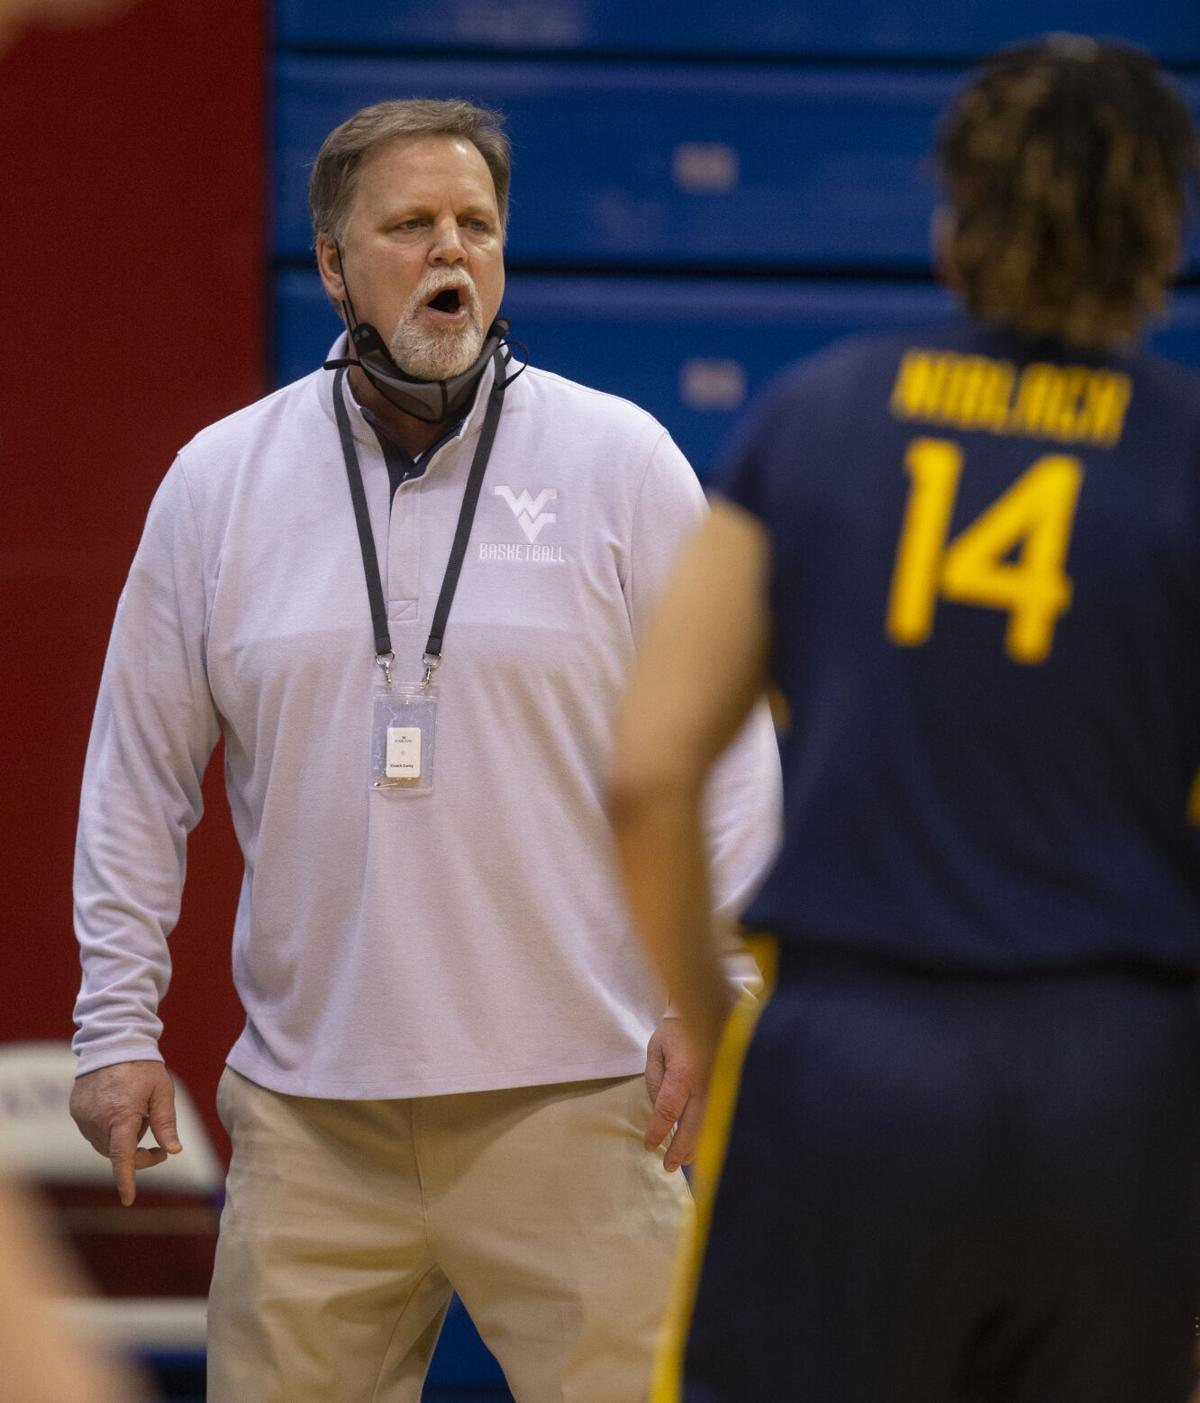 West Virginia head coach Mike Carey coaches his team against the Kansas Jayhawks in Lawrence, Kansas, on Feb. 27, 2021.